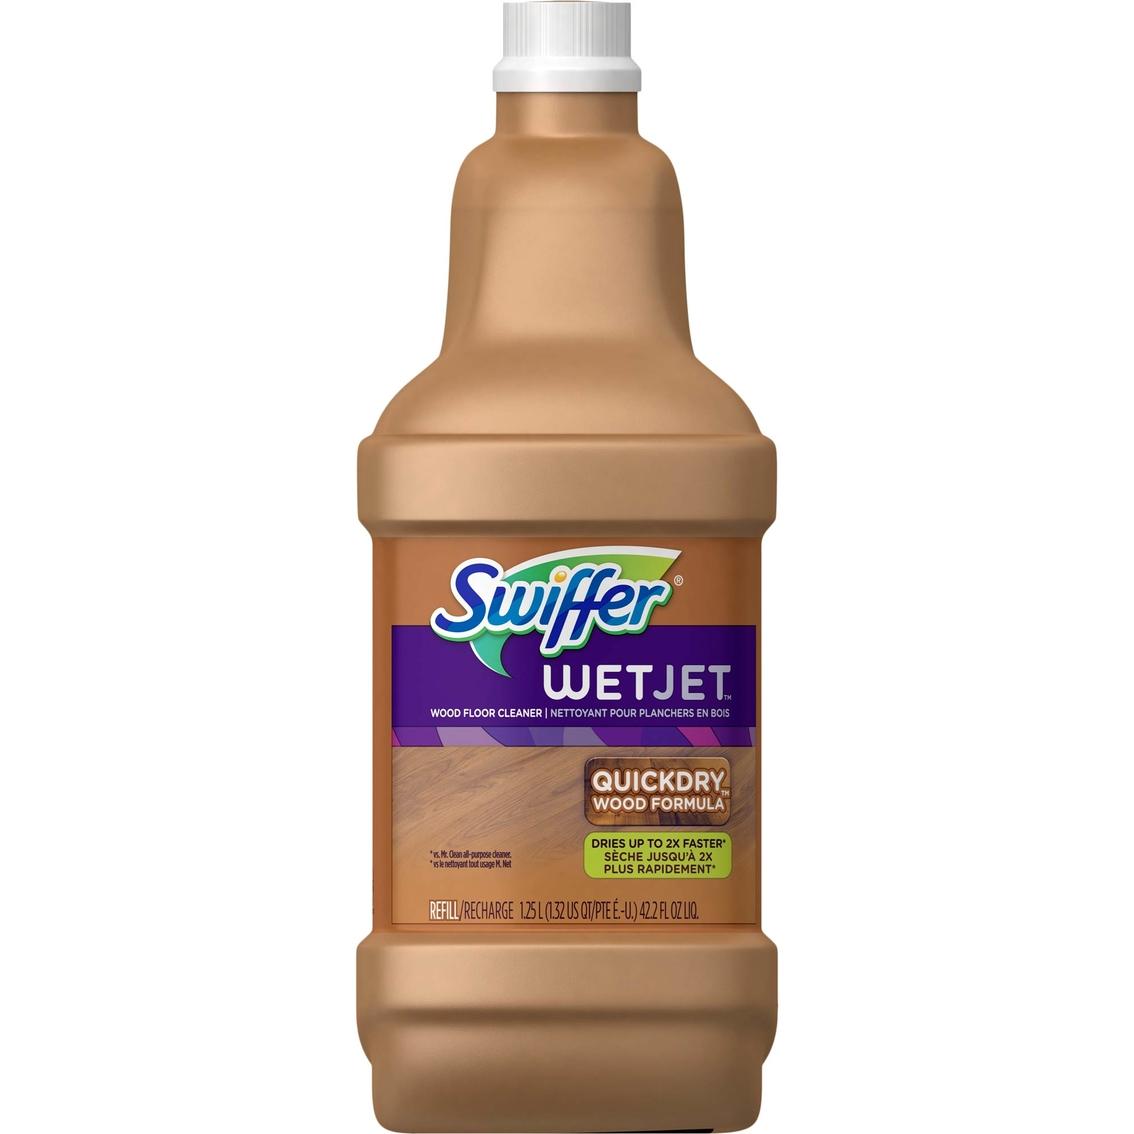 Swiffer Wetjet Multi Purpose Hardwood Floor Cleaner